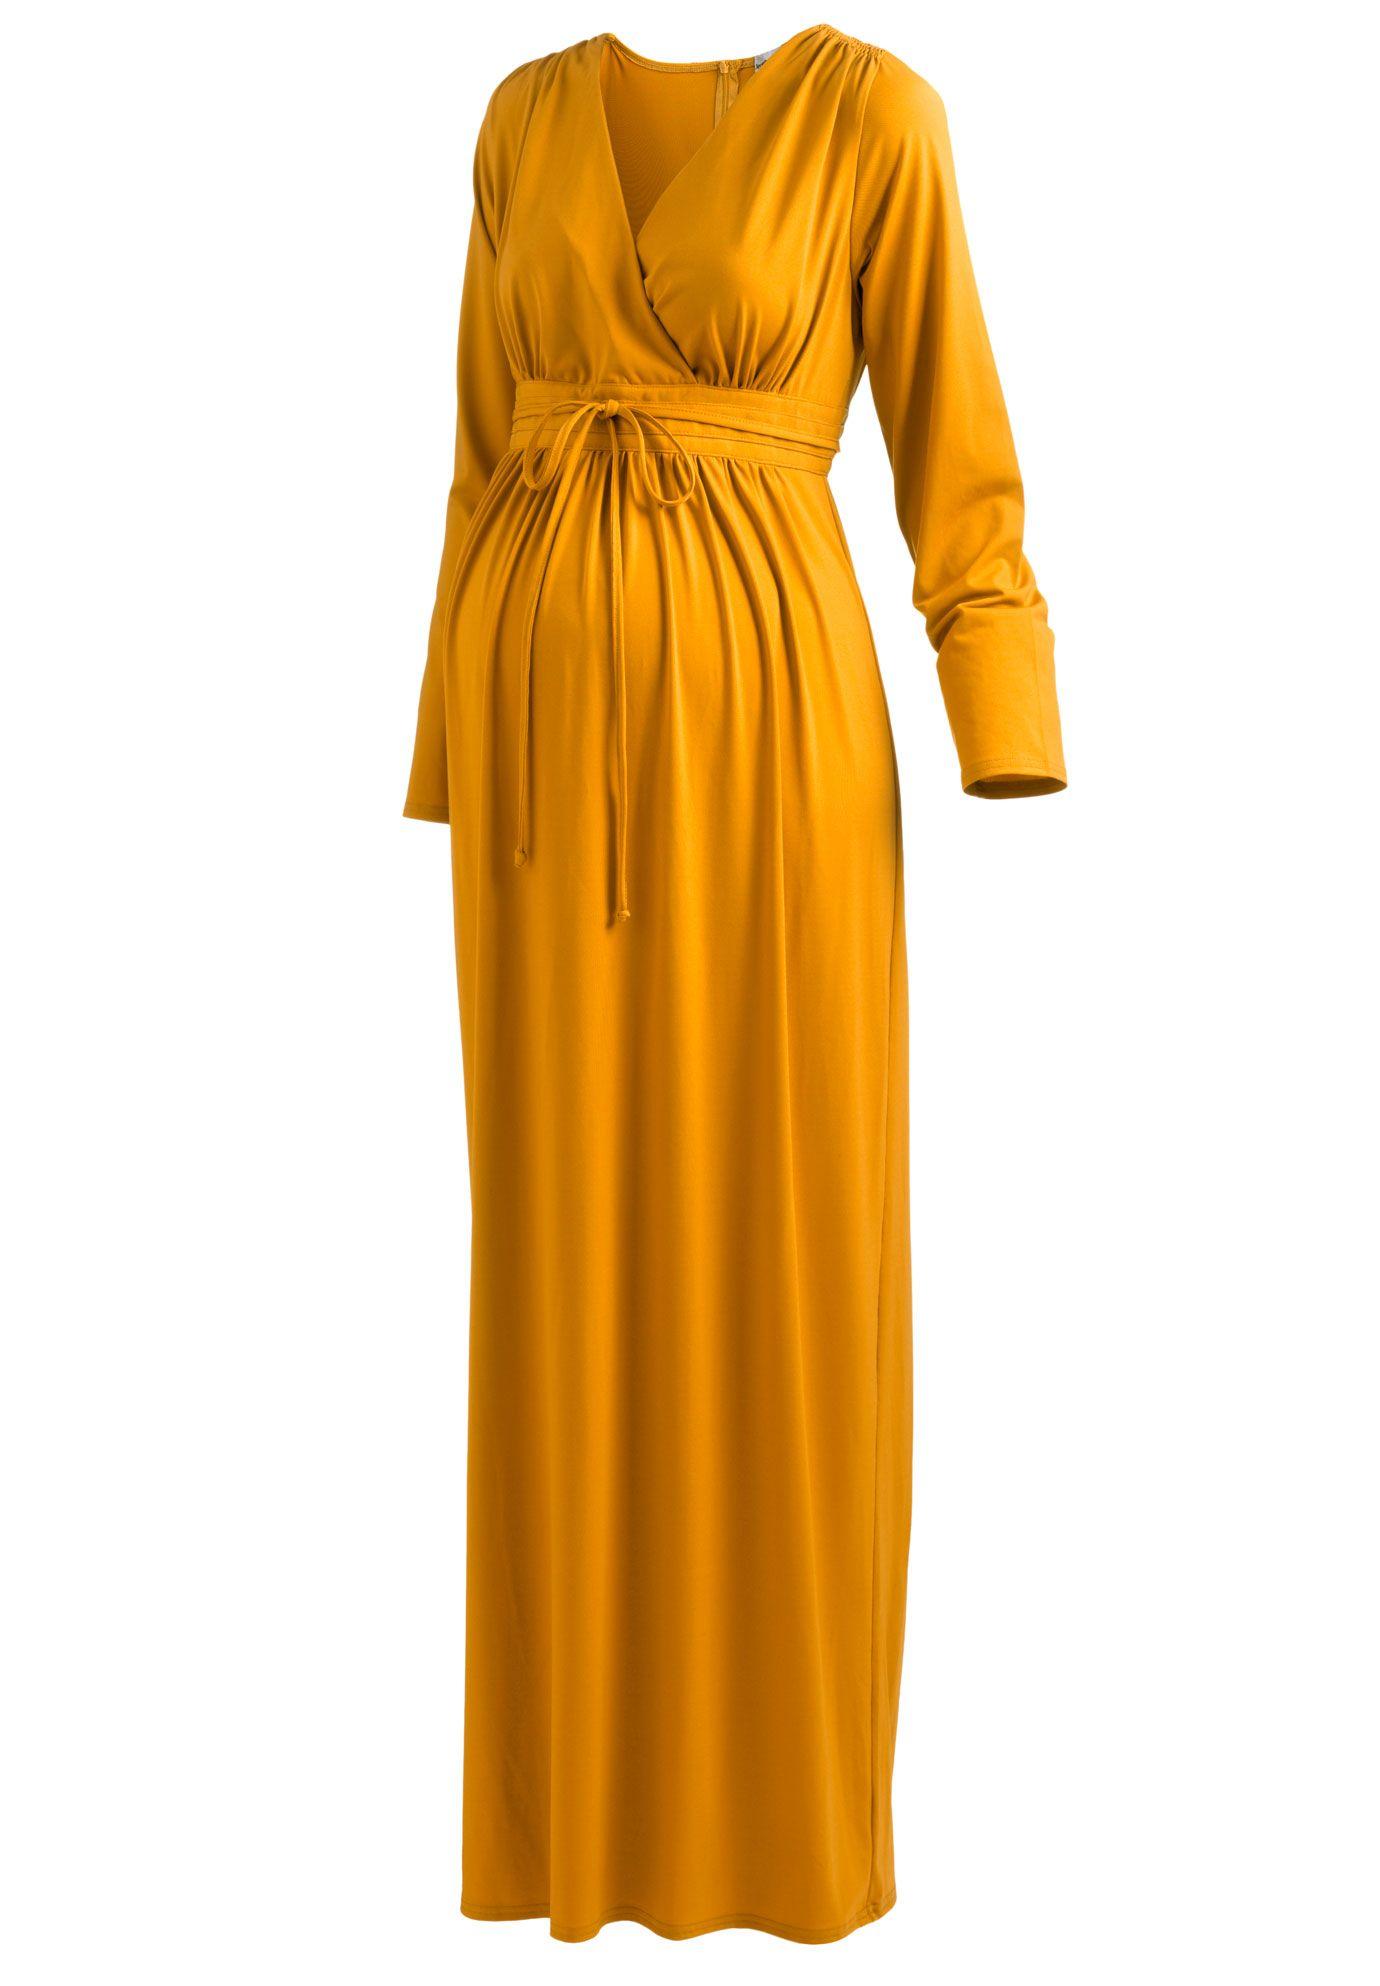 Maternity Knit Maxi Dress Honey Mustard 12 Plus Size in Winter 2012